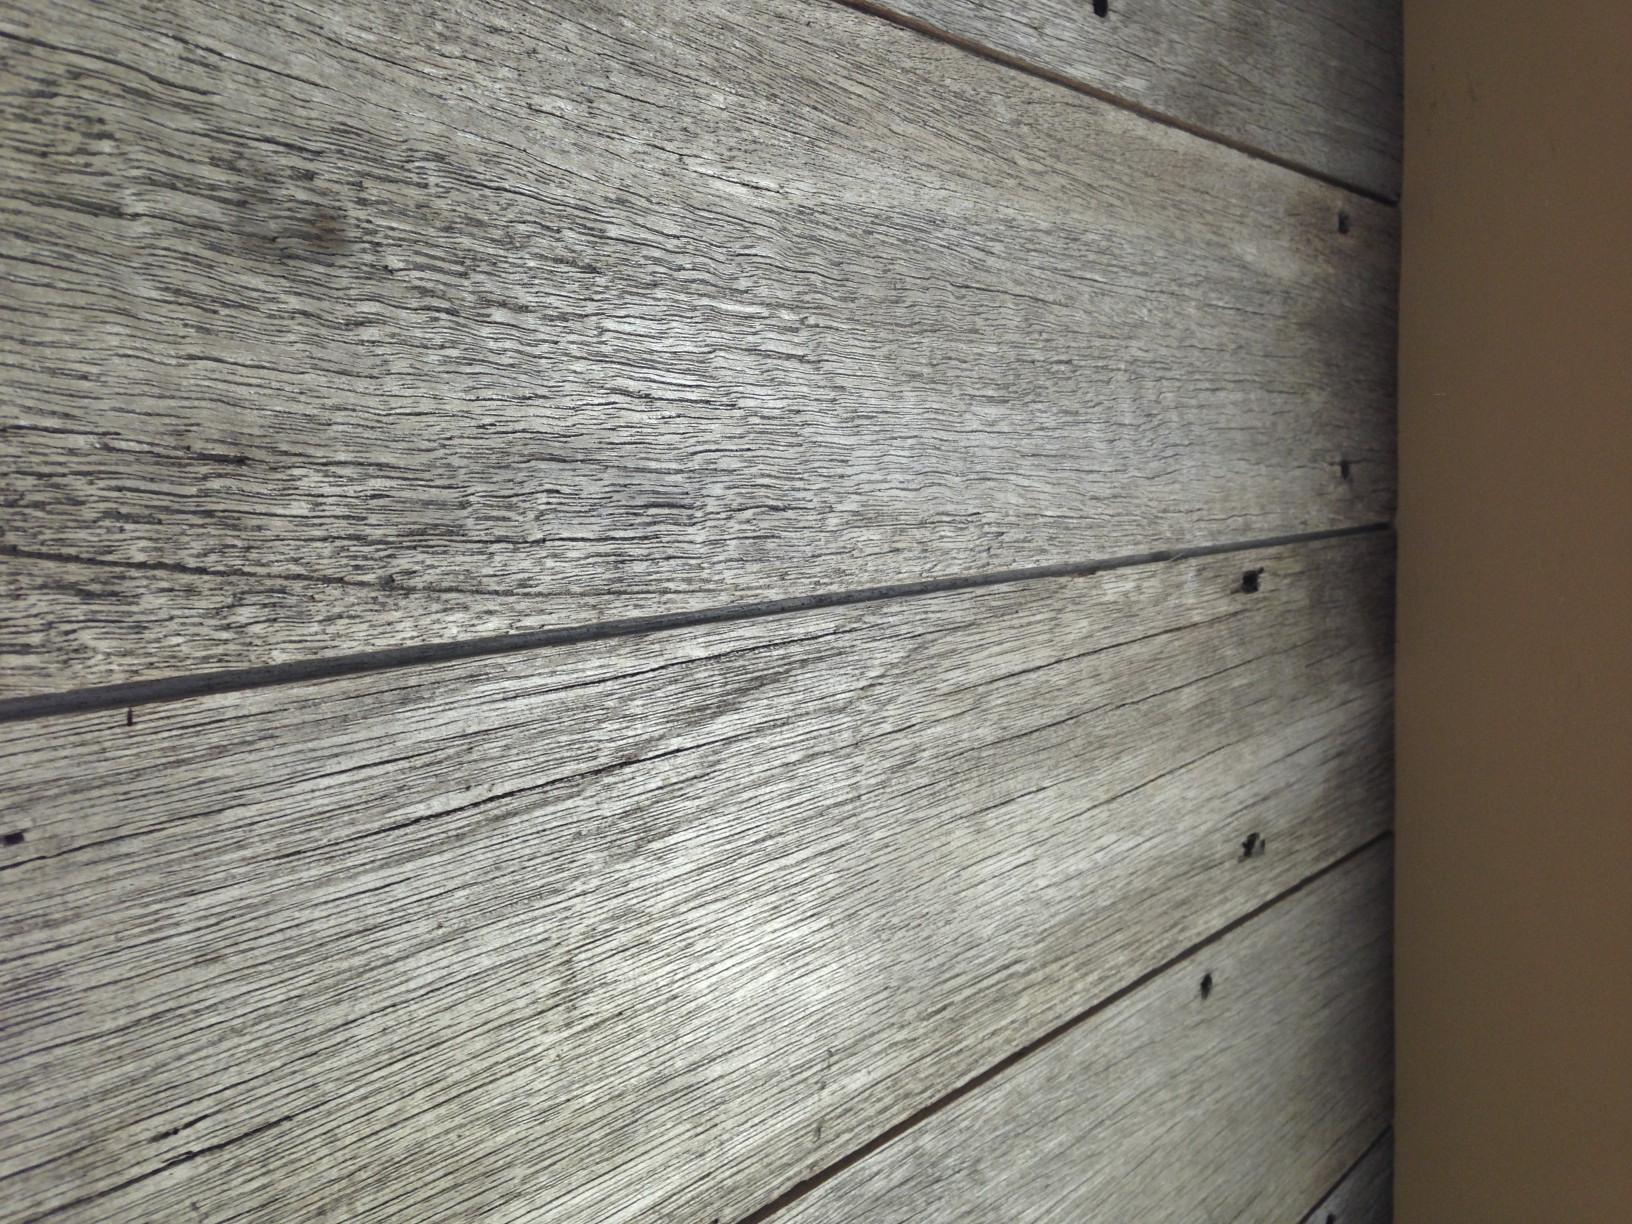 Weathered Gray Wood Wall